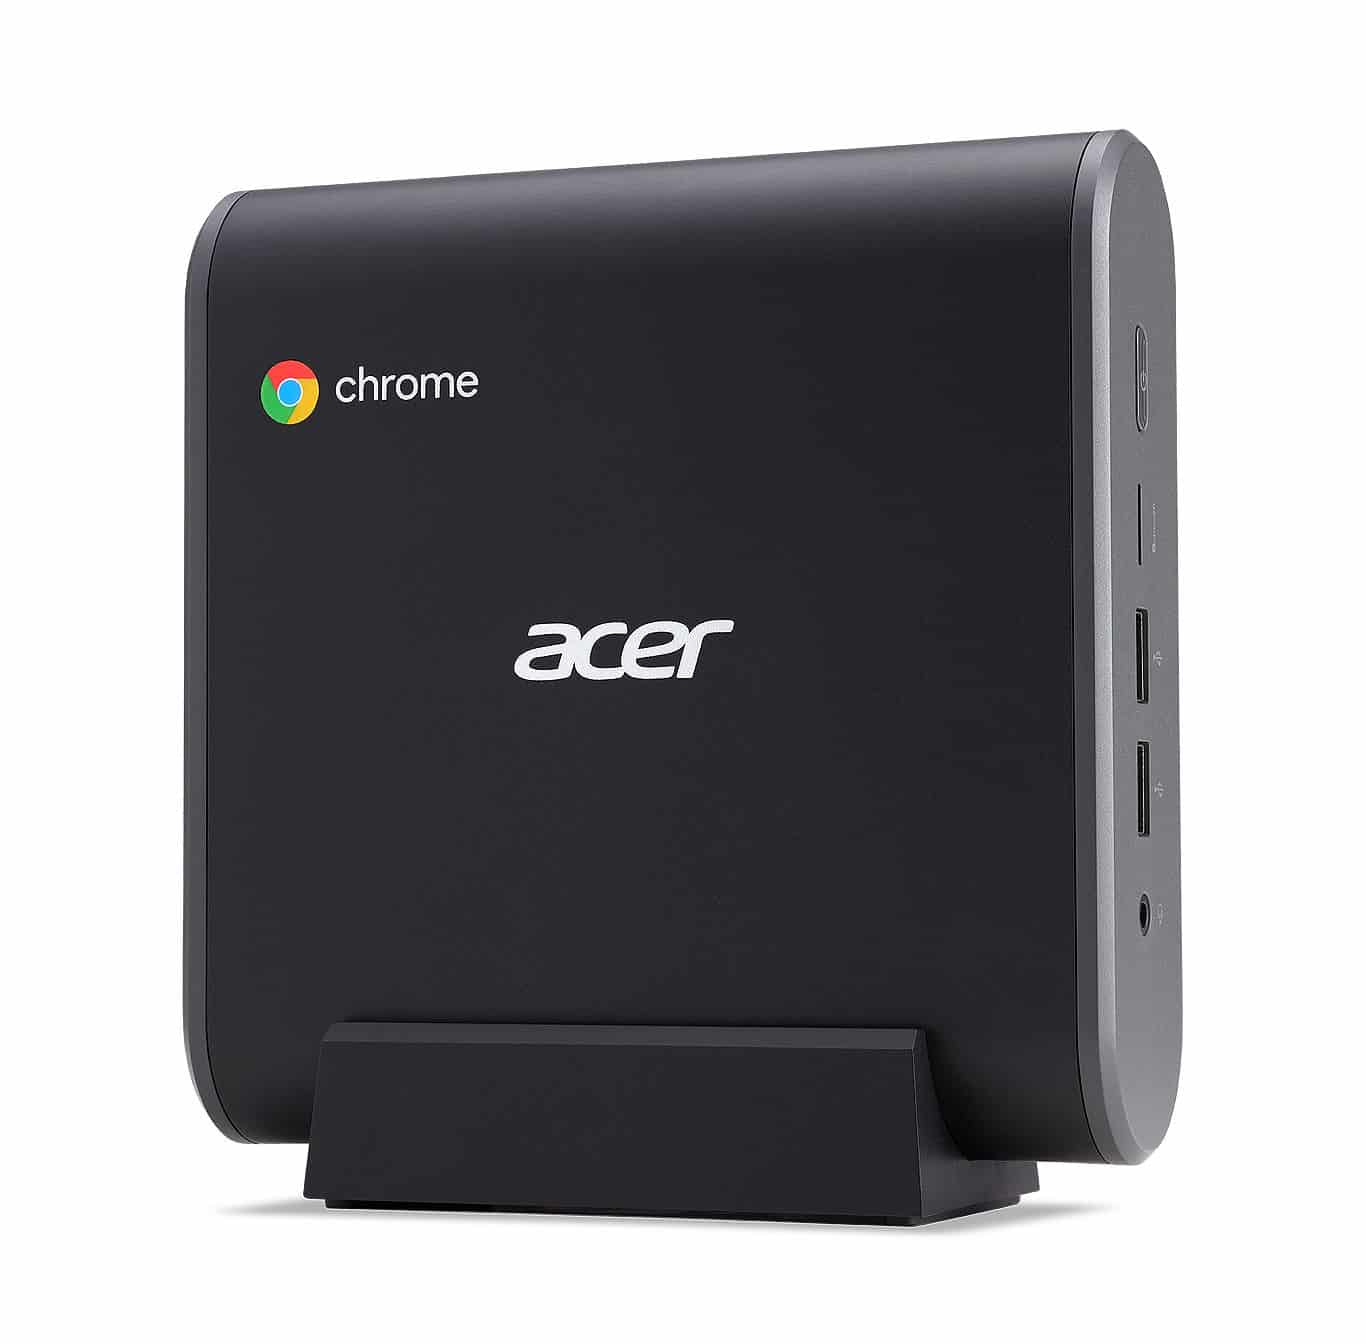 Acer Chromebox CXI3 5